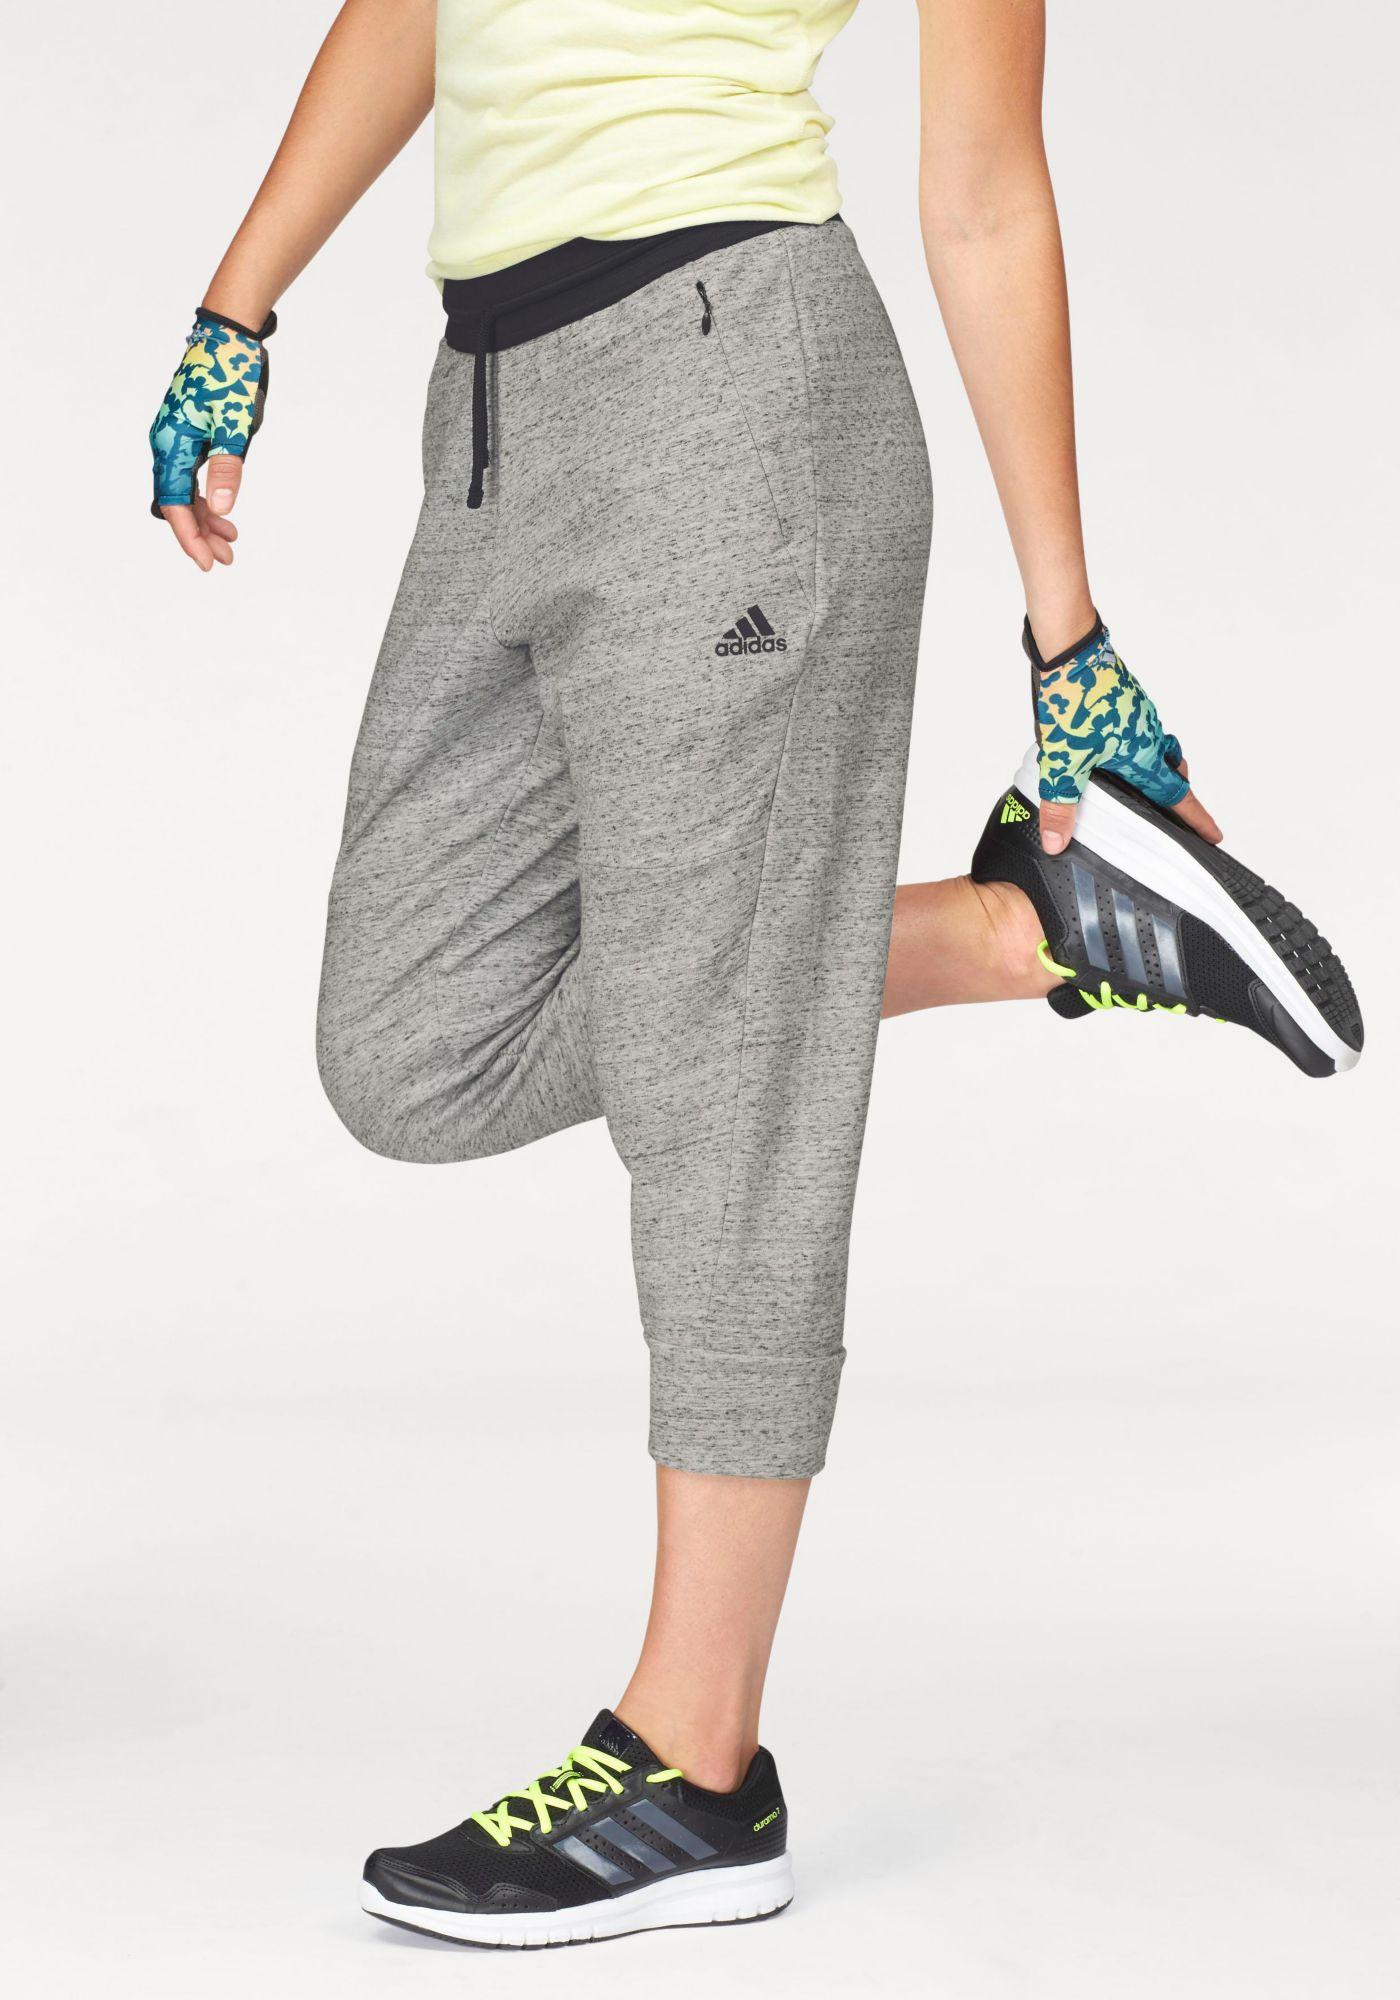 ADIDAS PERFORMANCE adidas Performance 3/4-Hose »COTTON FLEECE 3/4 PANT«